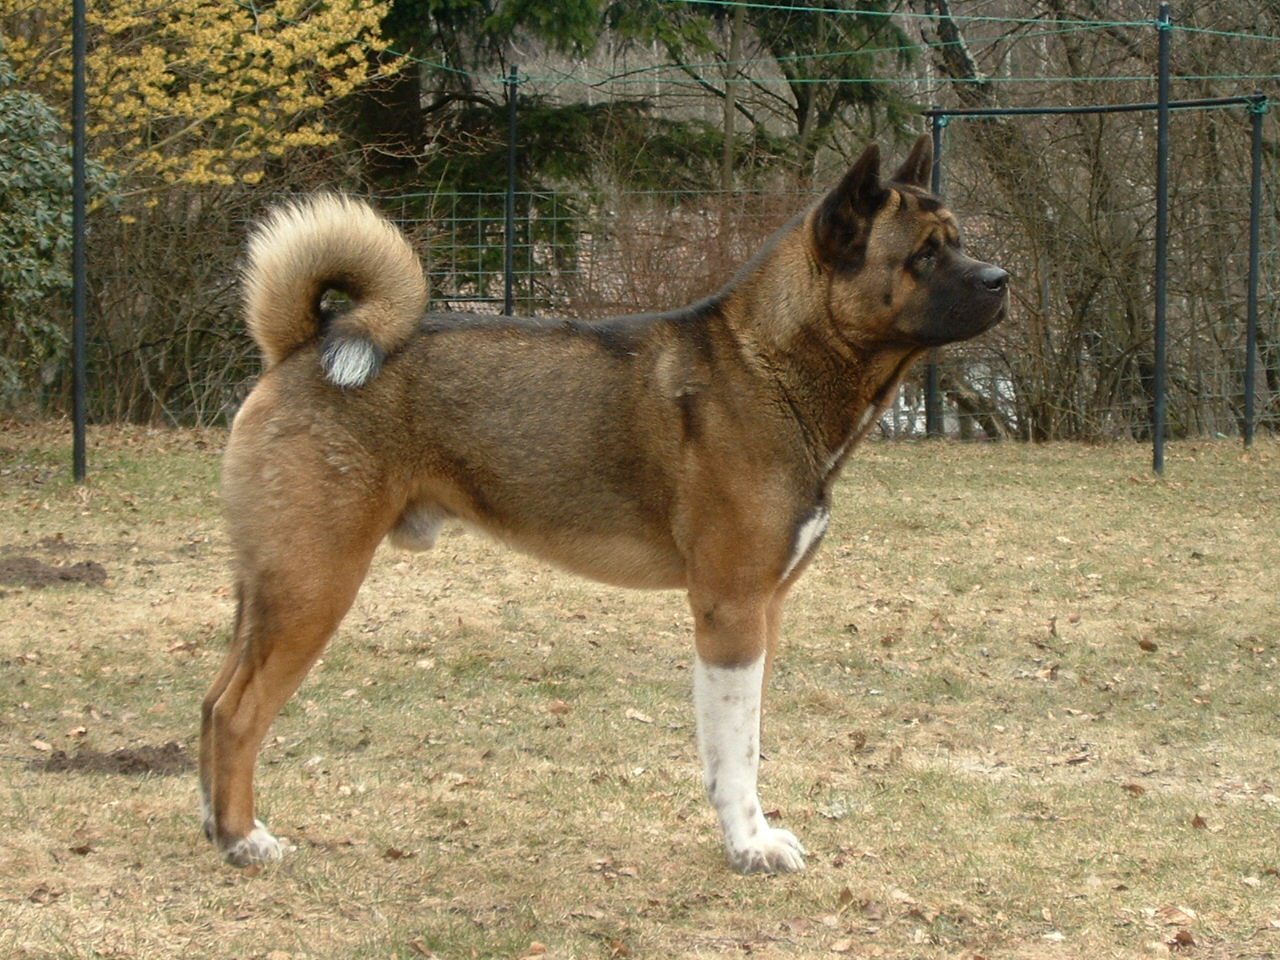 inu akita, akita pics, akita photos, akita fotos, pics of akita, akita pictures, dog akita, akita dog, puppy pictures, pictures of dogs, dogs pictures, akita